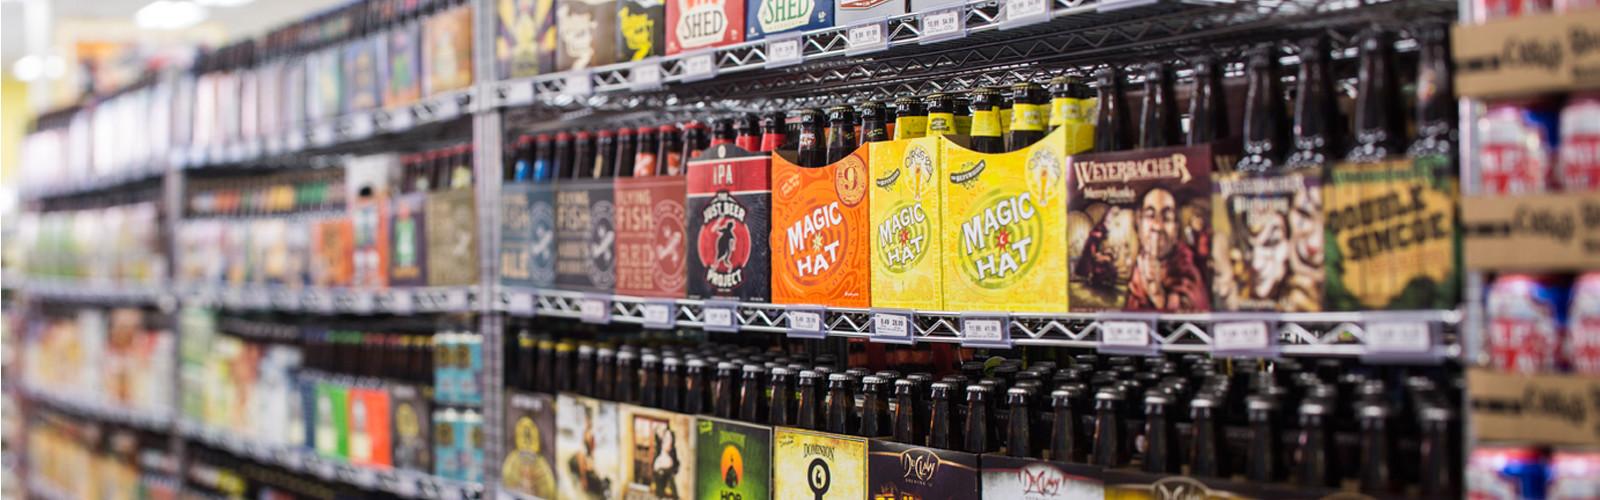 Minnesota Beer Wholesalers Association